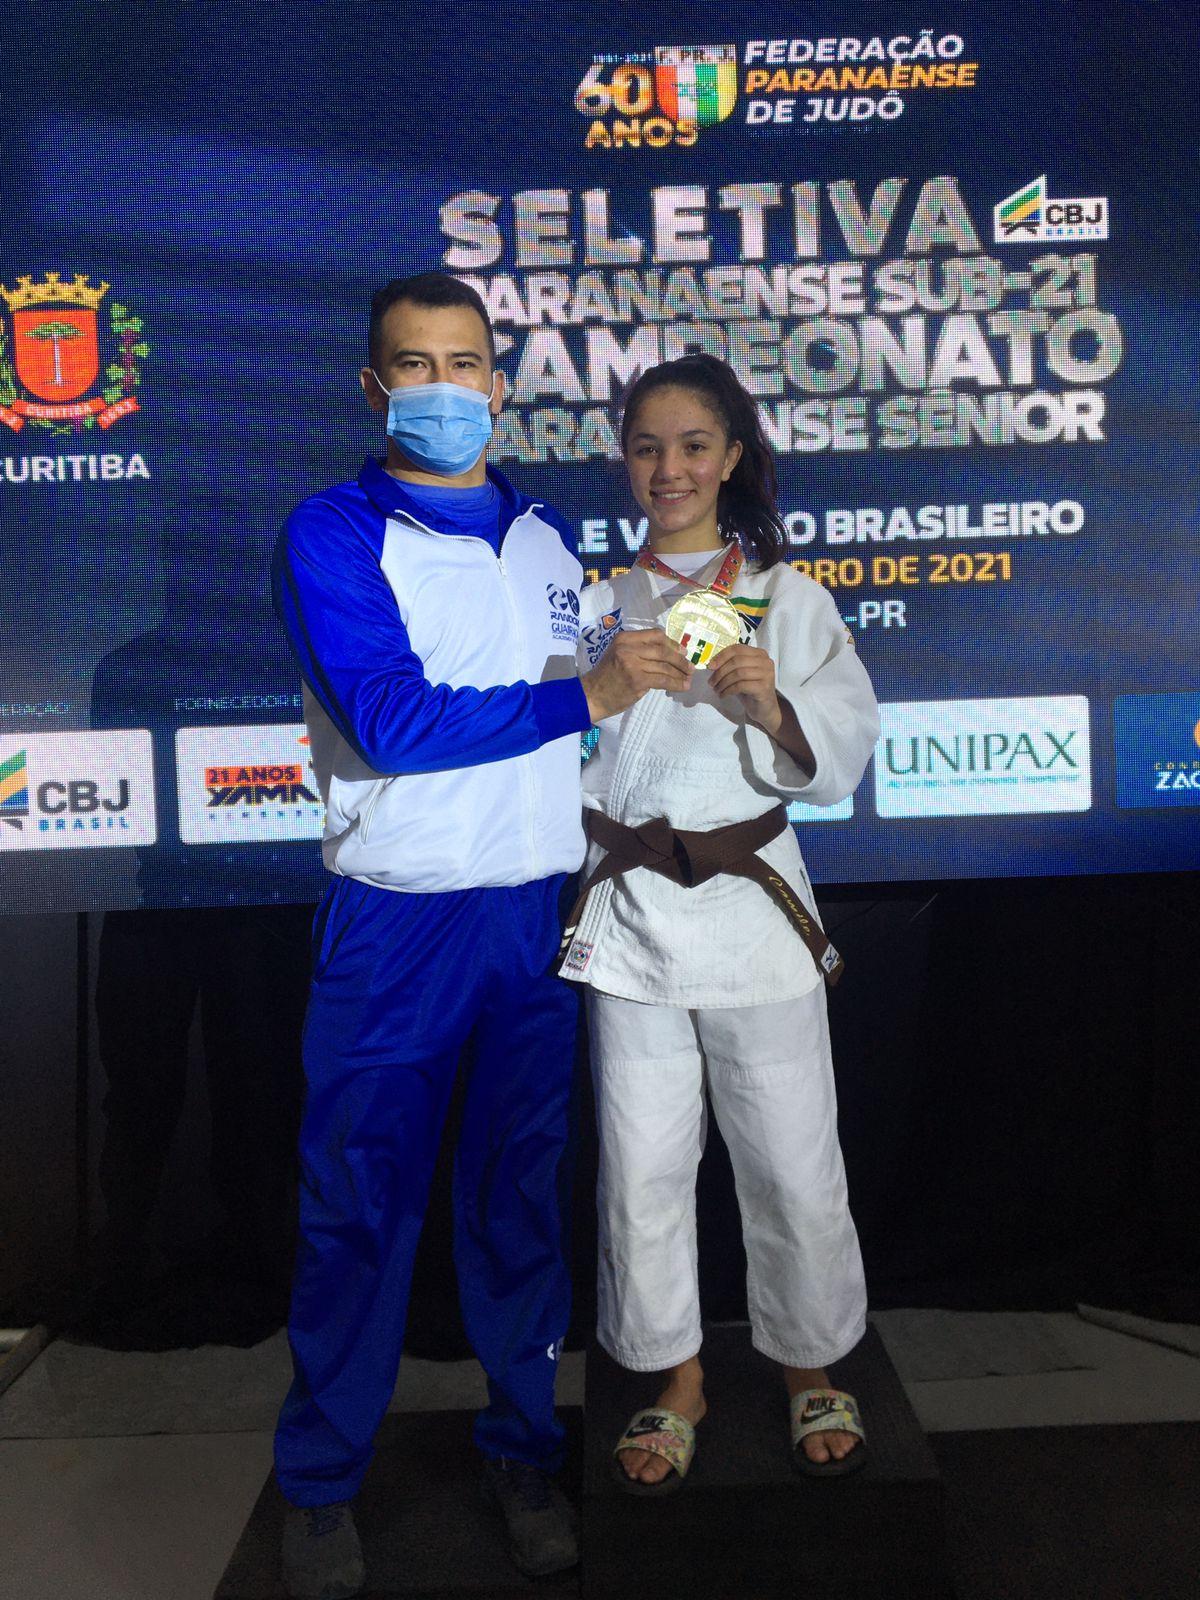 Judoca do Colégio Guairacá se classifica para Campeonato Brasileiro